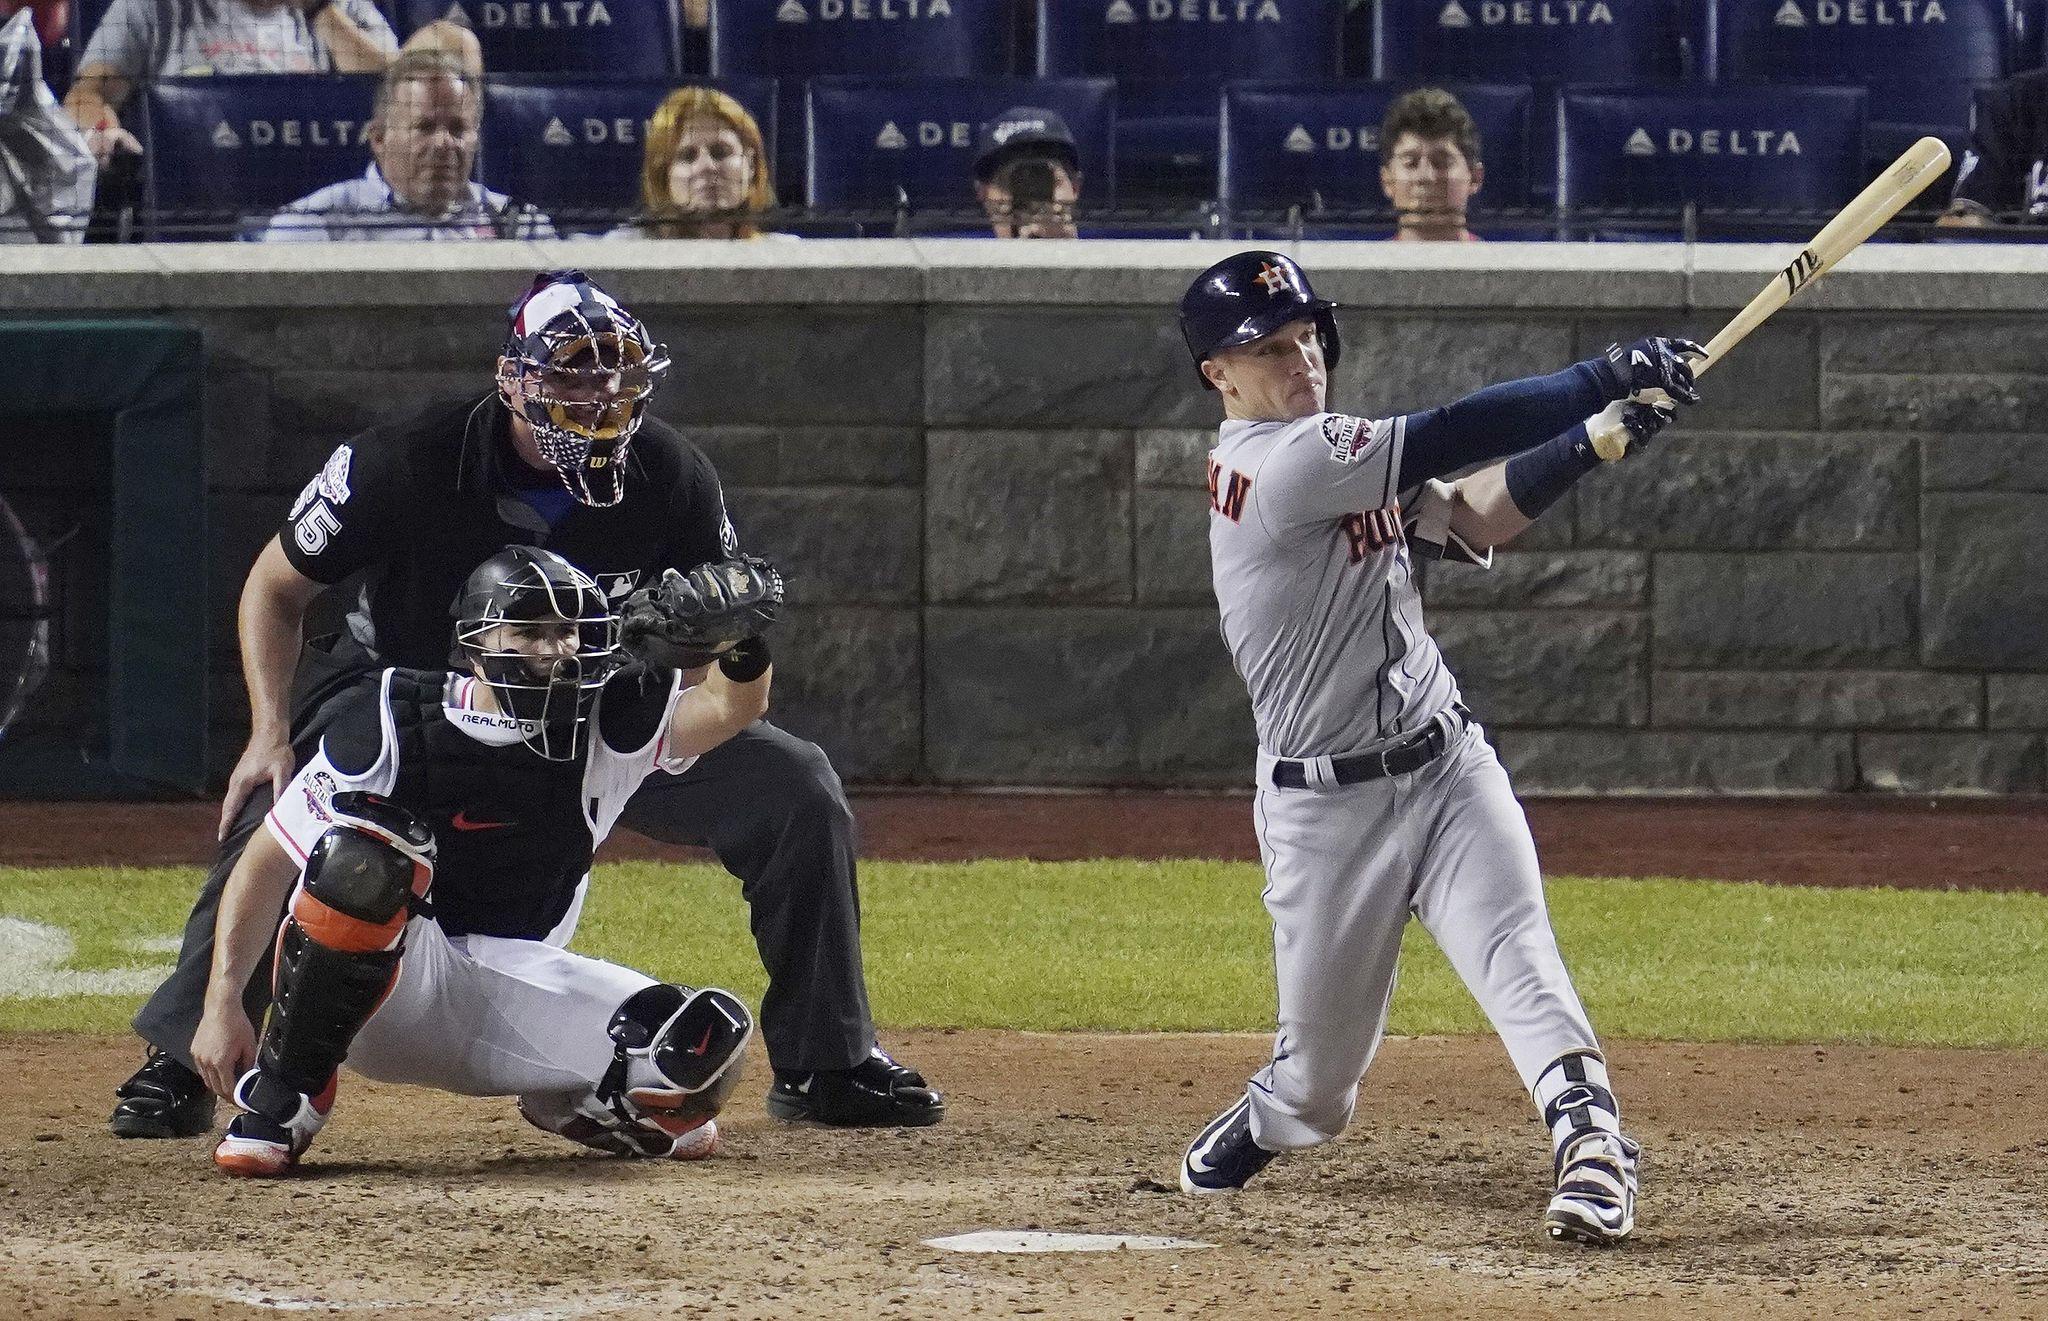 All_star_game_baseball_78313_s2048x1321